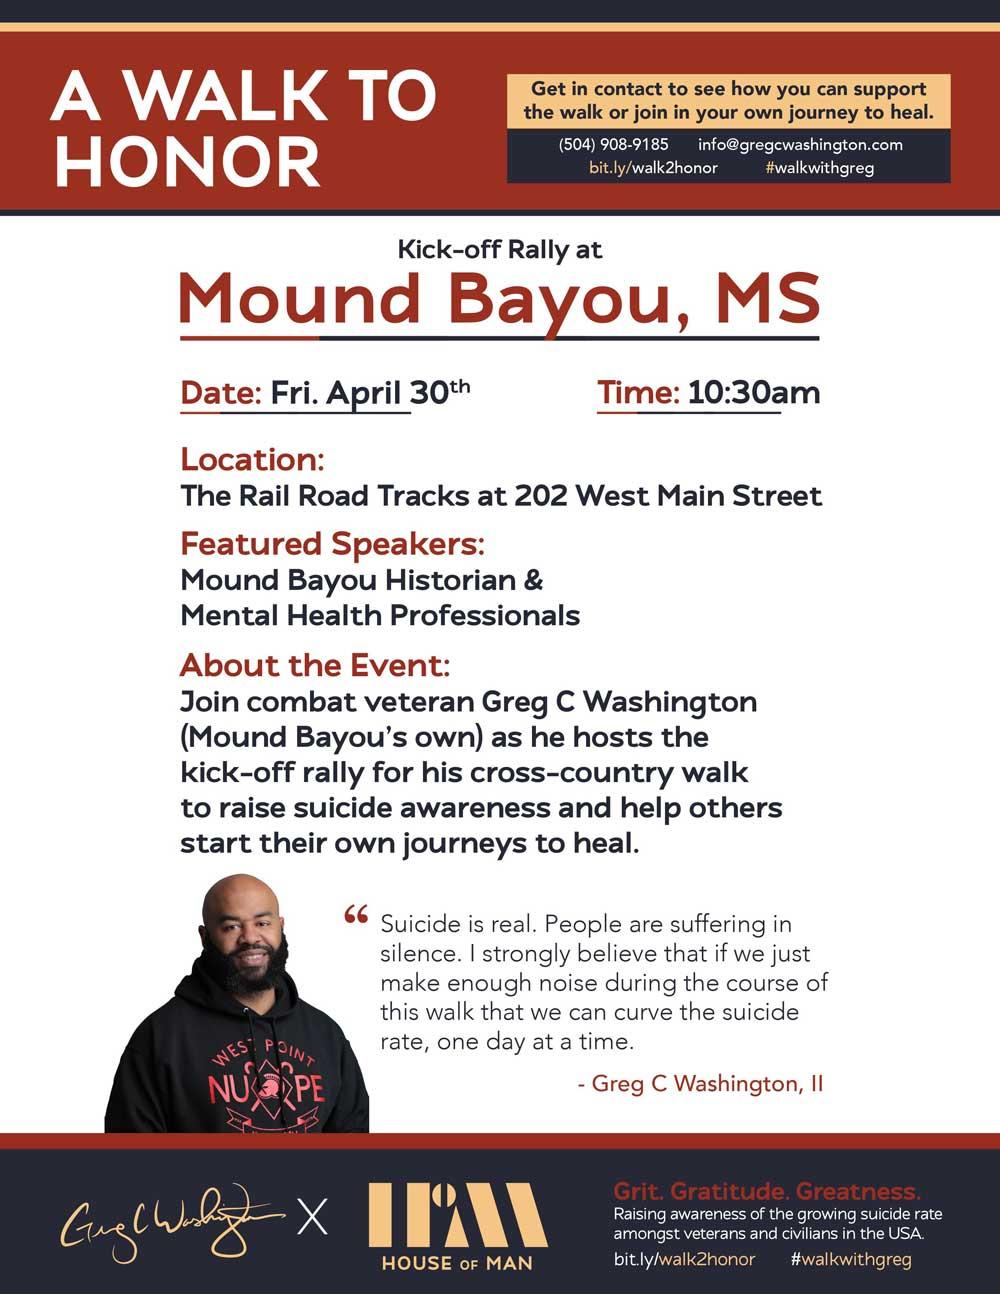 mound-bayou